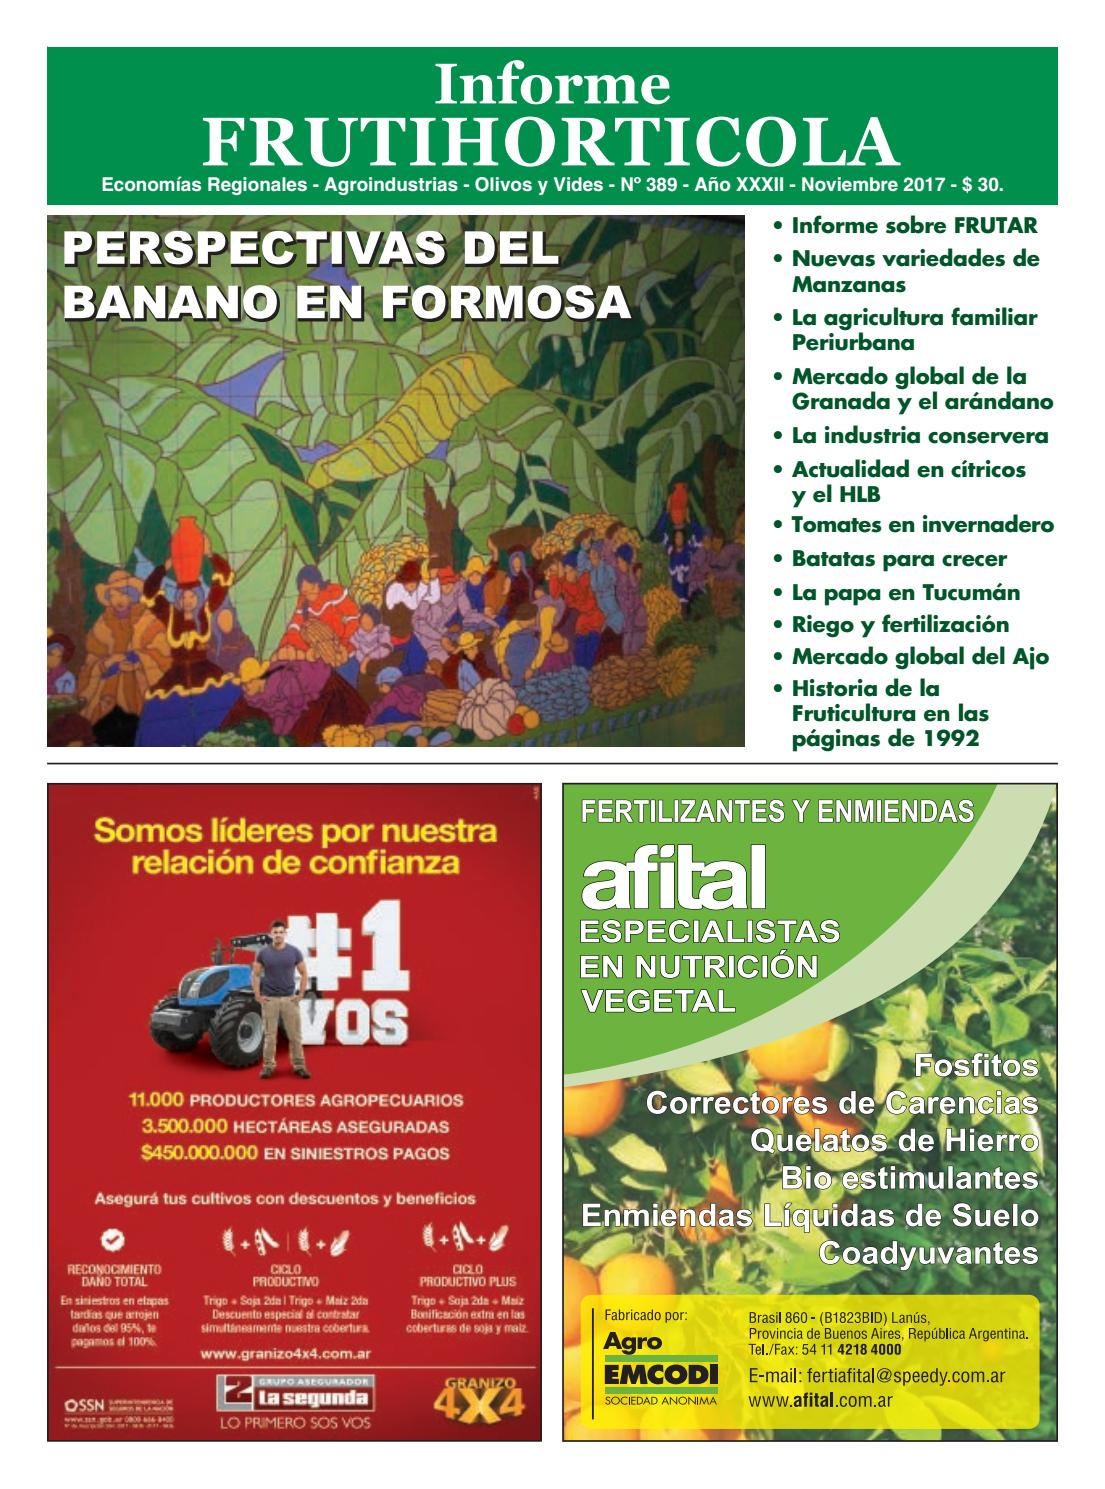 Informe noviembre 2017 by Horticultura & Poscosecha - issuu